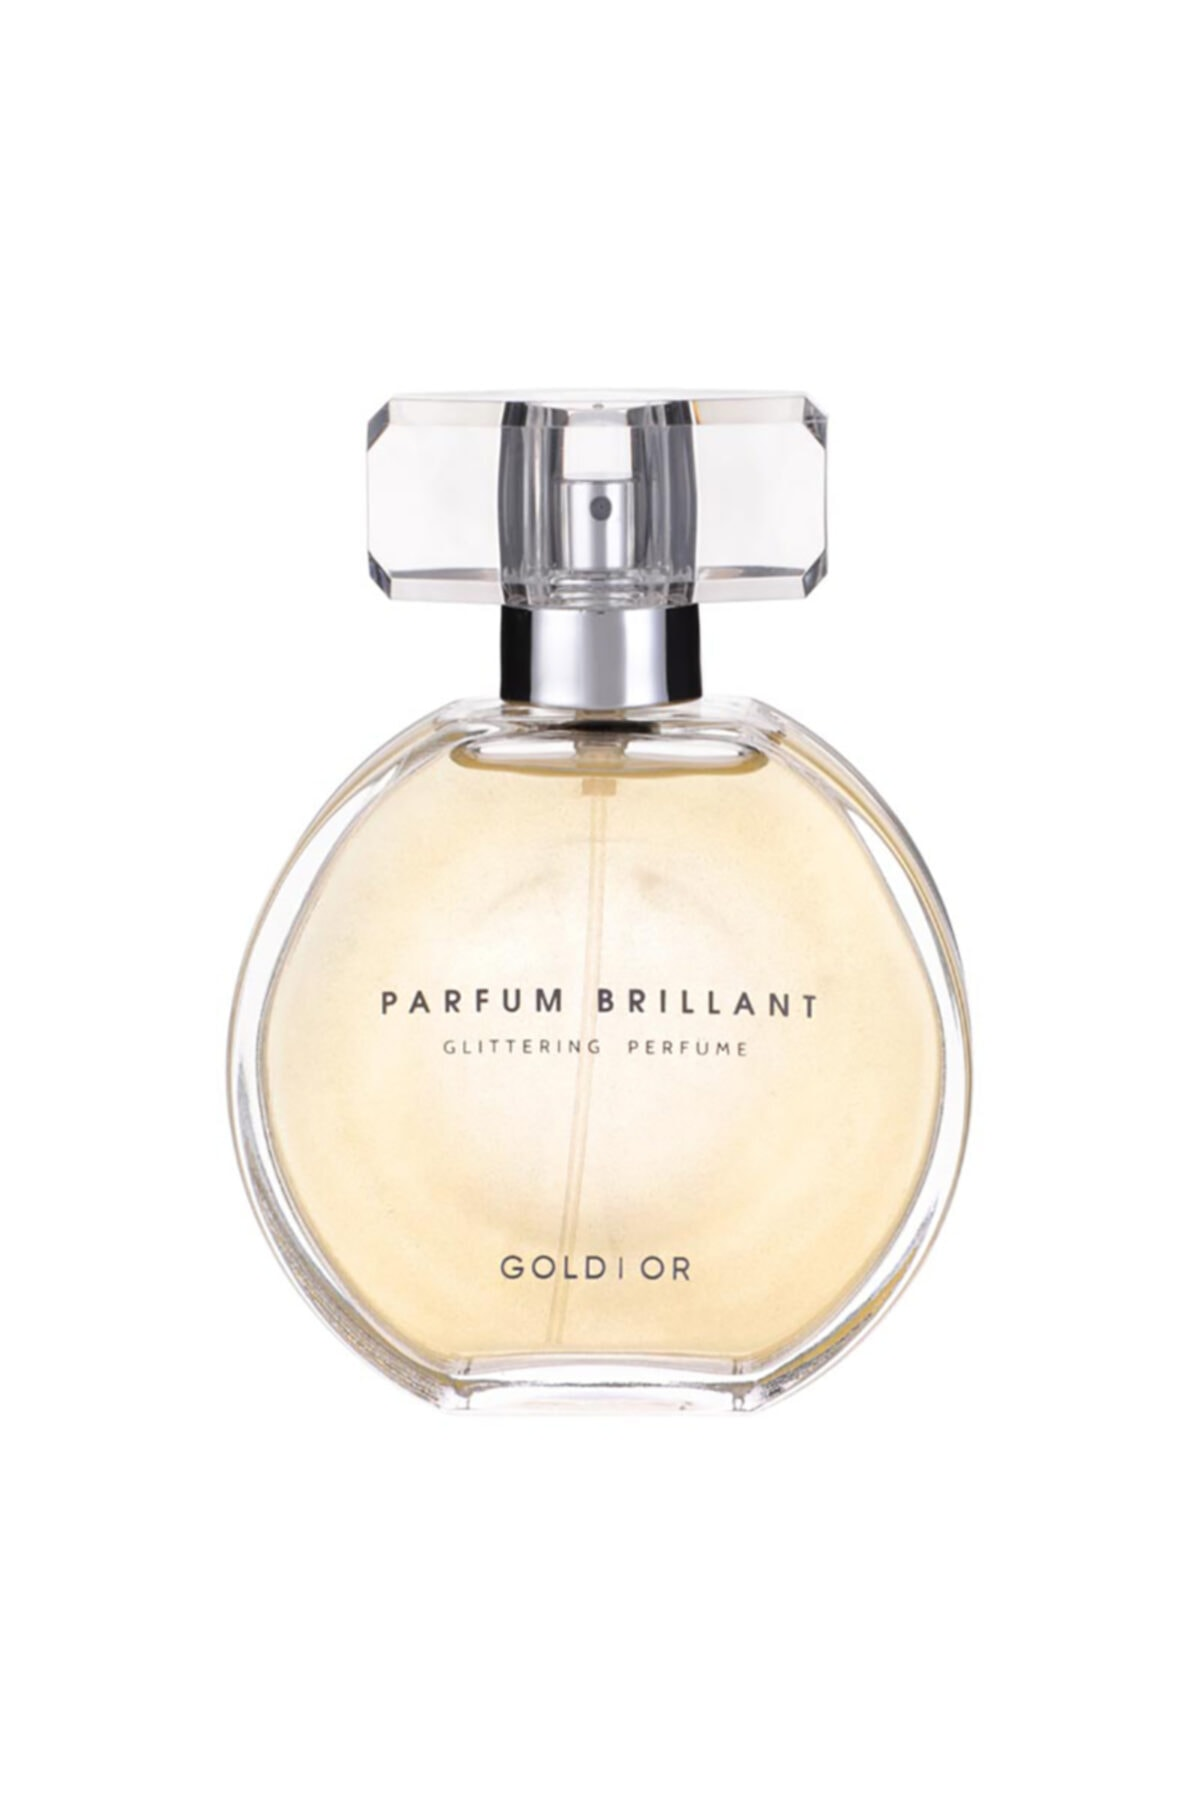 Miniso Mınıso Glittering Perfume (gold) 1